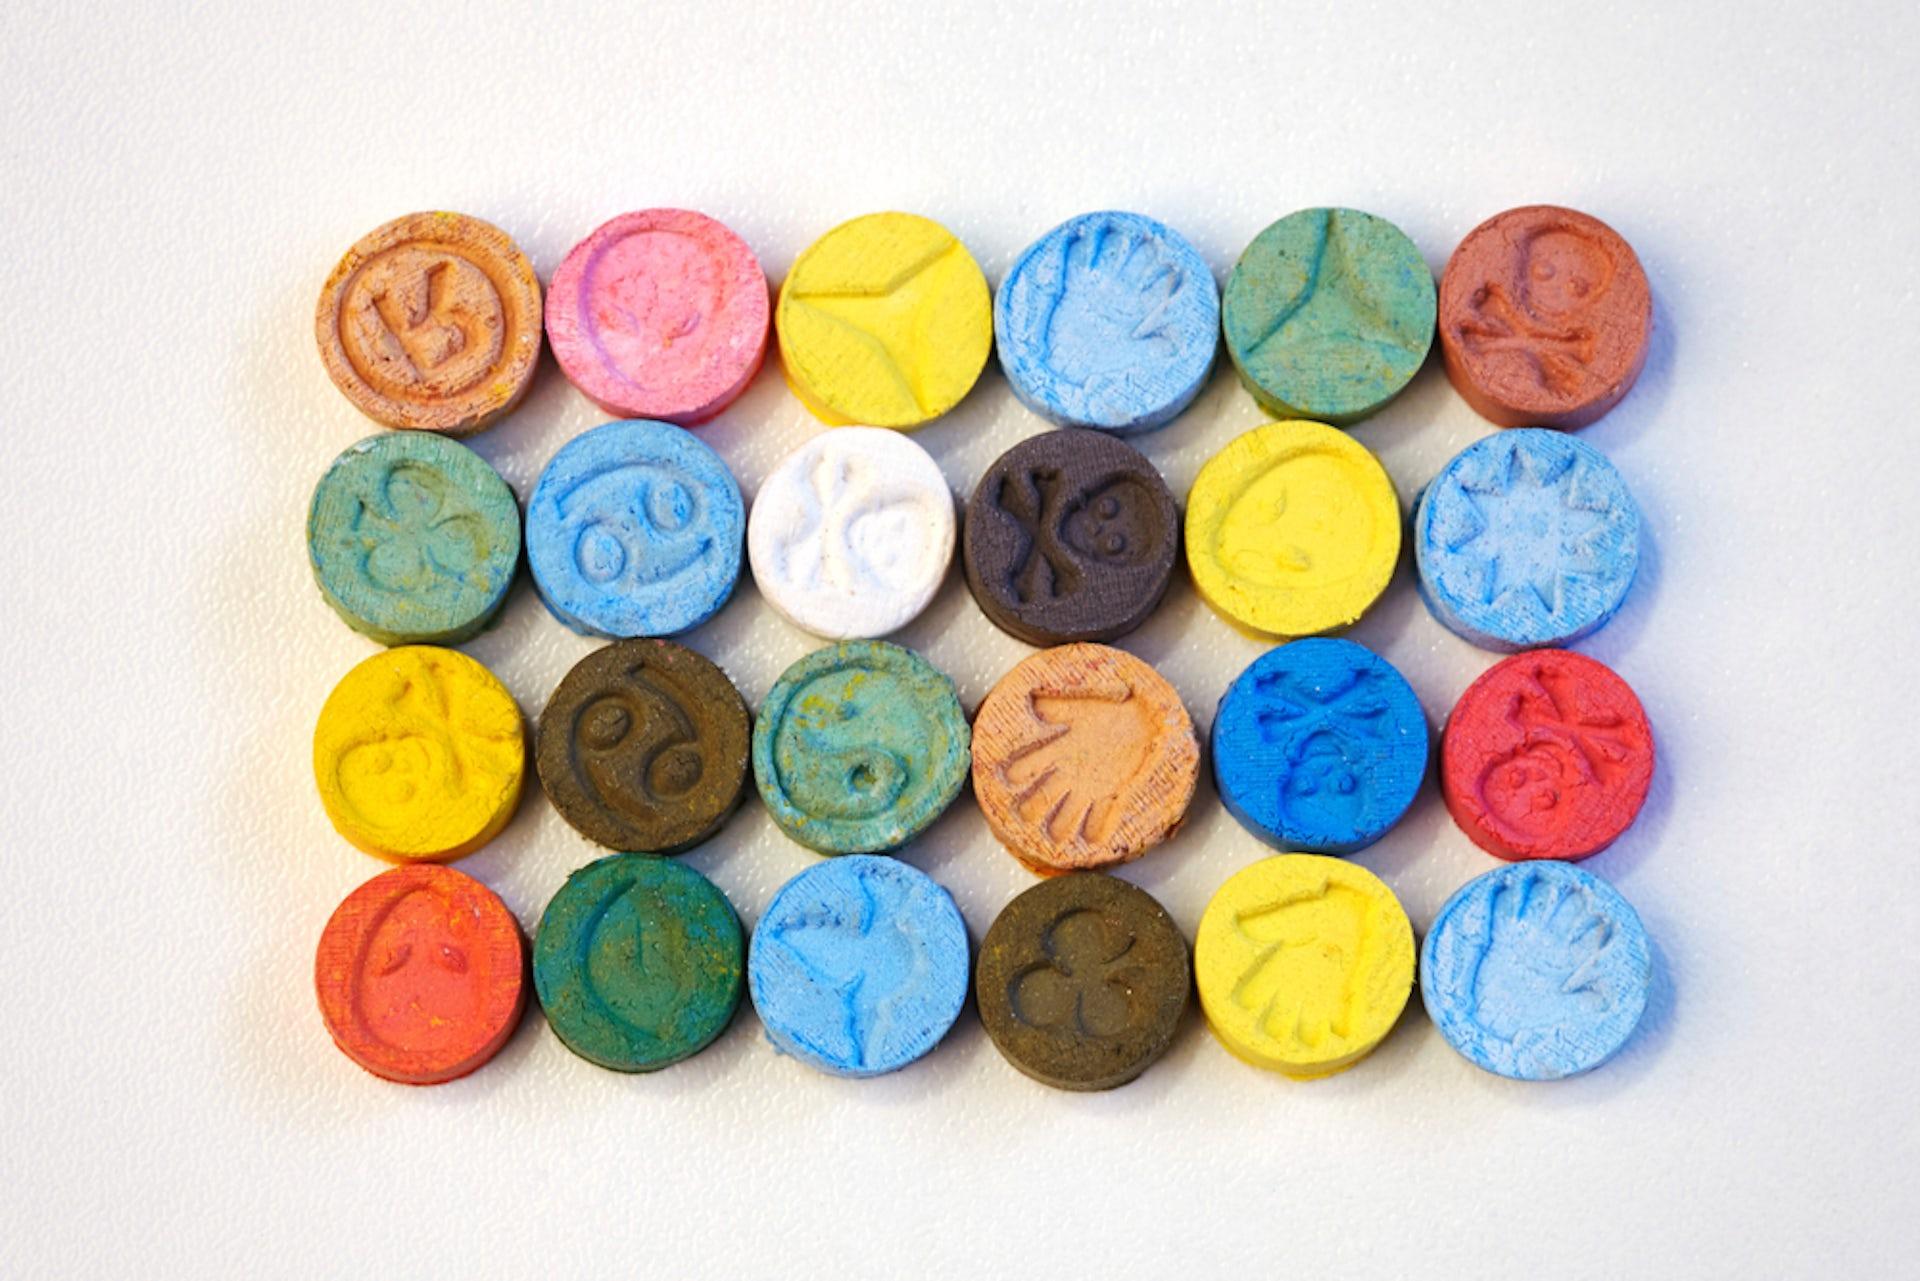 ecstasy users are more empathetic than those who take